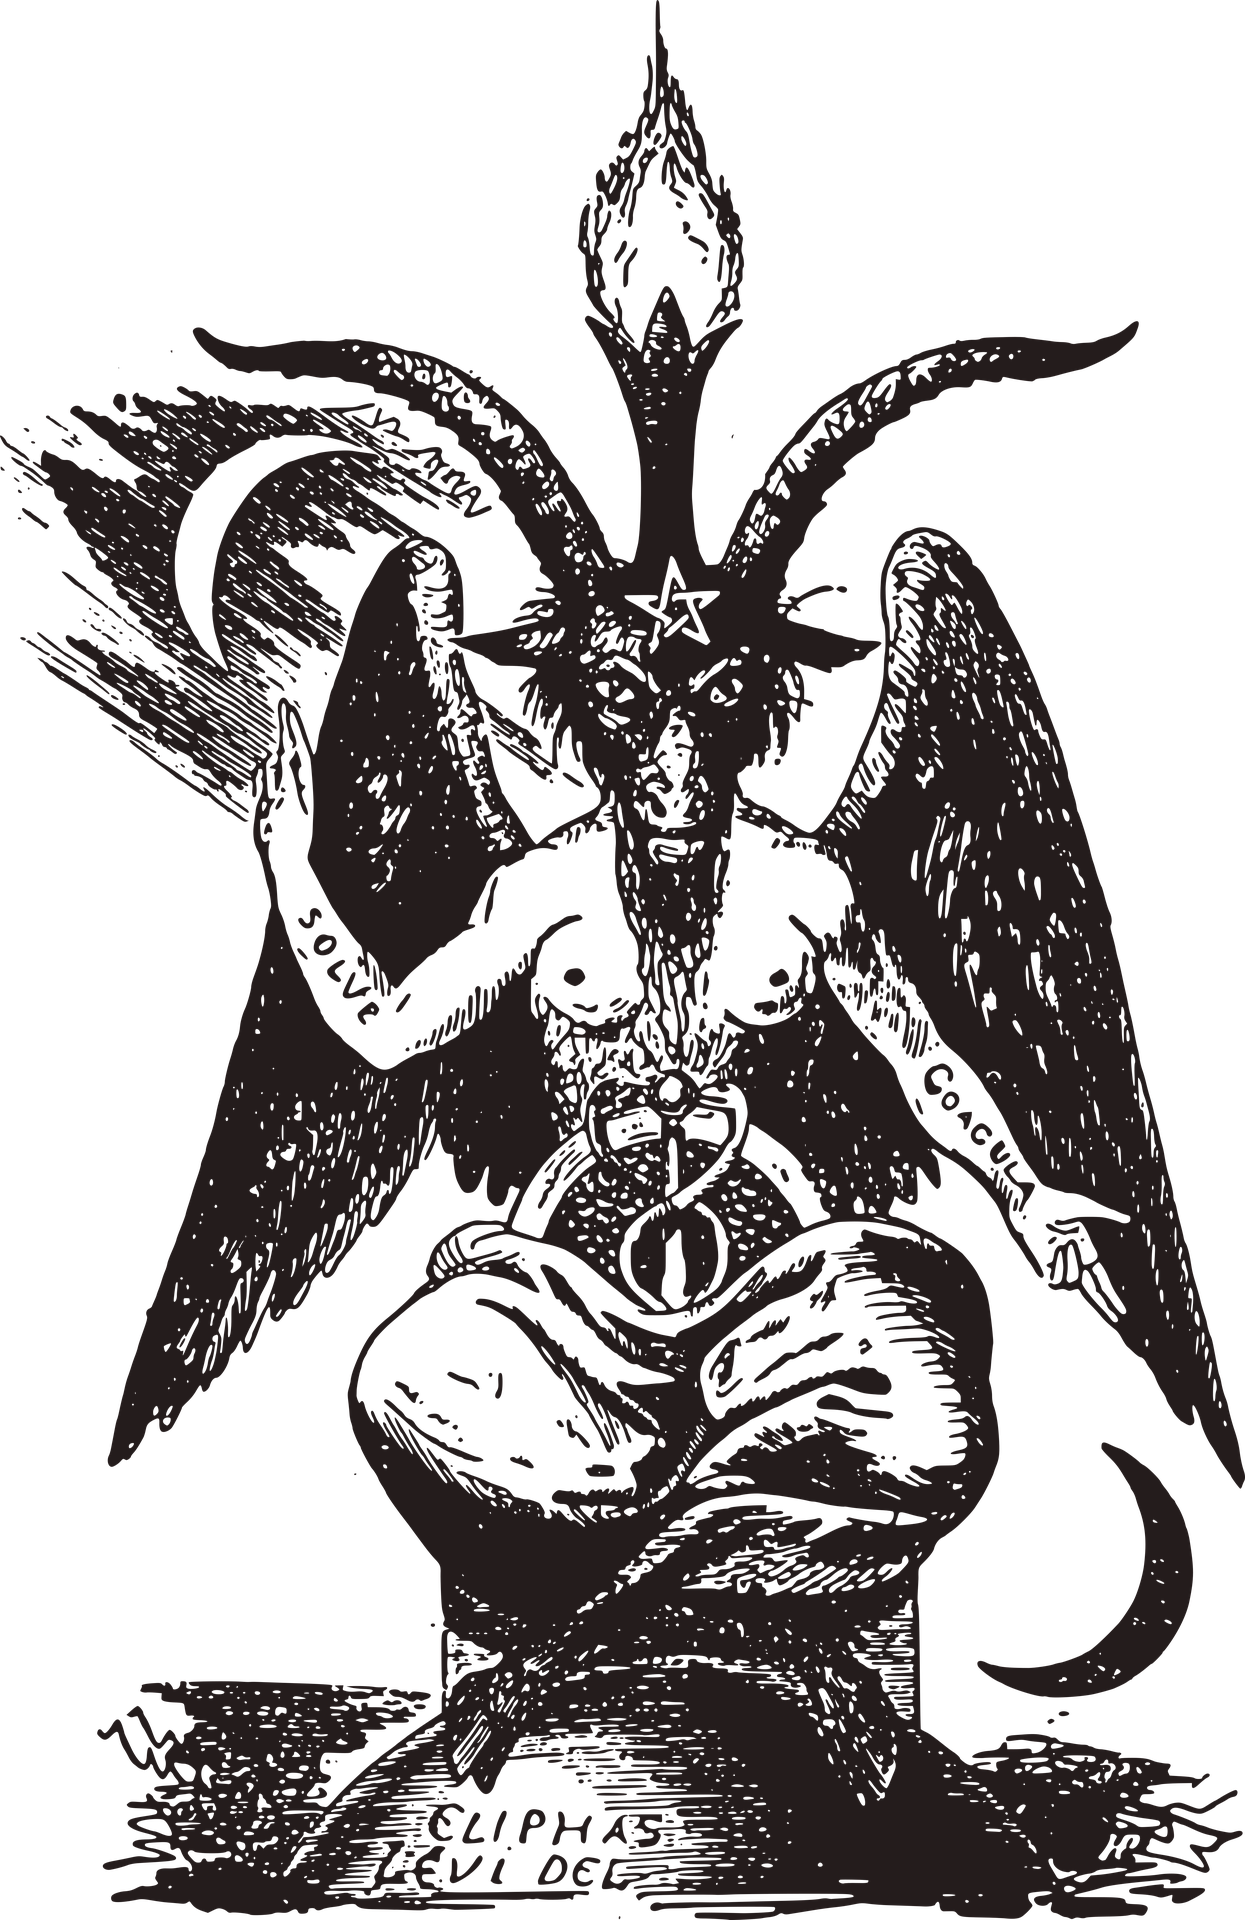 jpg Png satanic occult ritualistic. Satan transparent